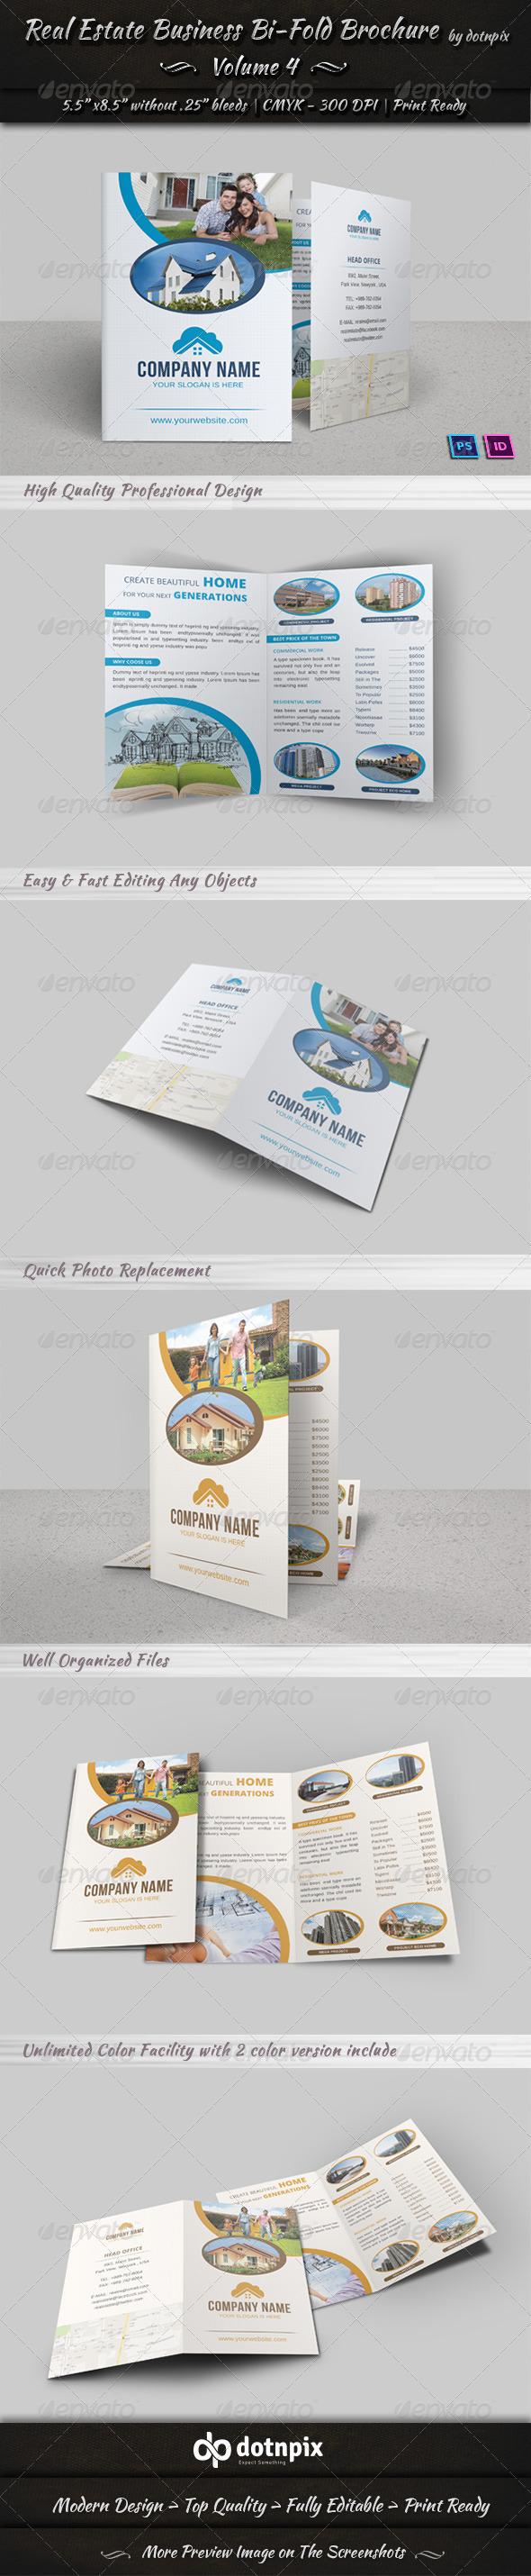 Real Estate Business Bi-Fold Brochure | Volume 4 - Corporate Brochures